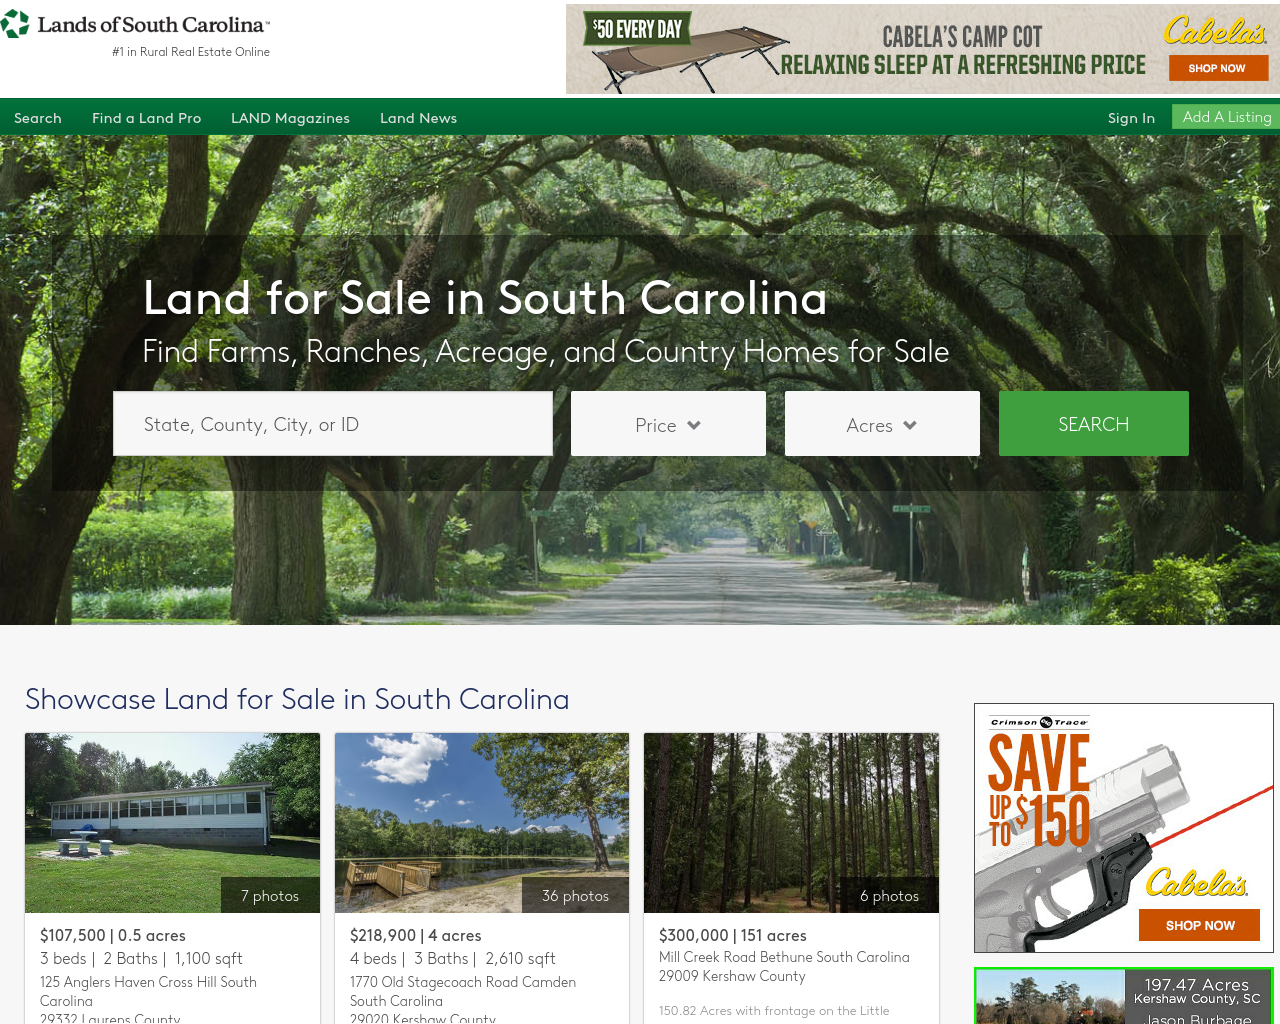 Lands-of-South-Carolina-Advertising-Reviews-Pricing